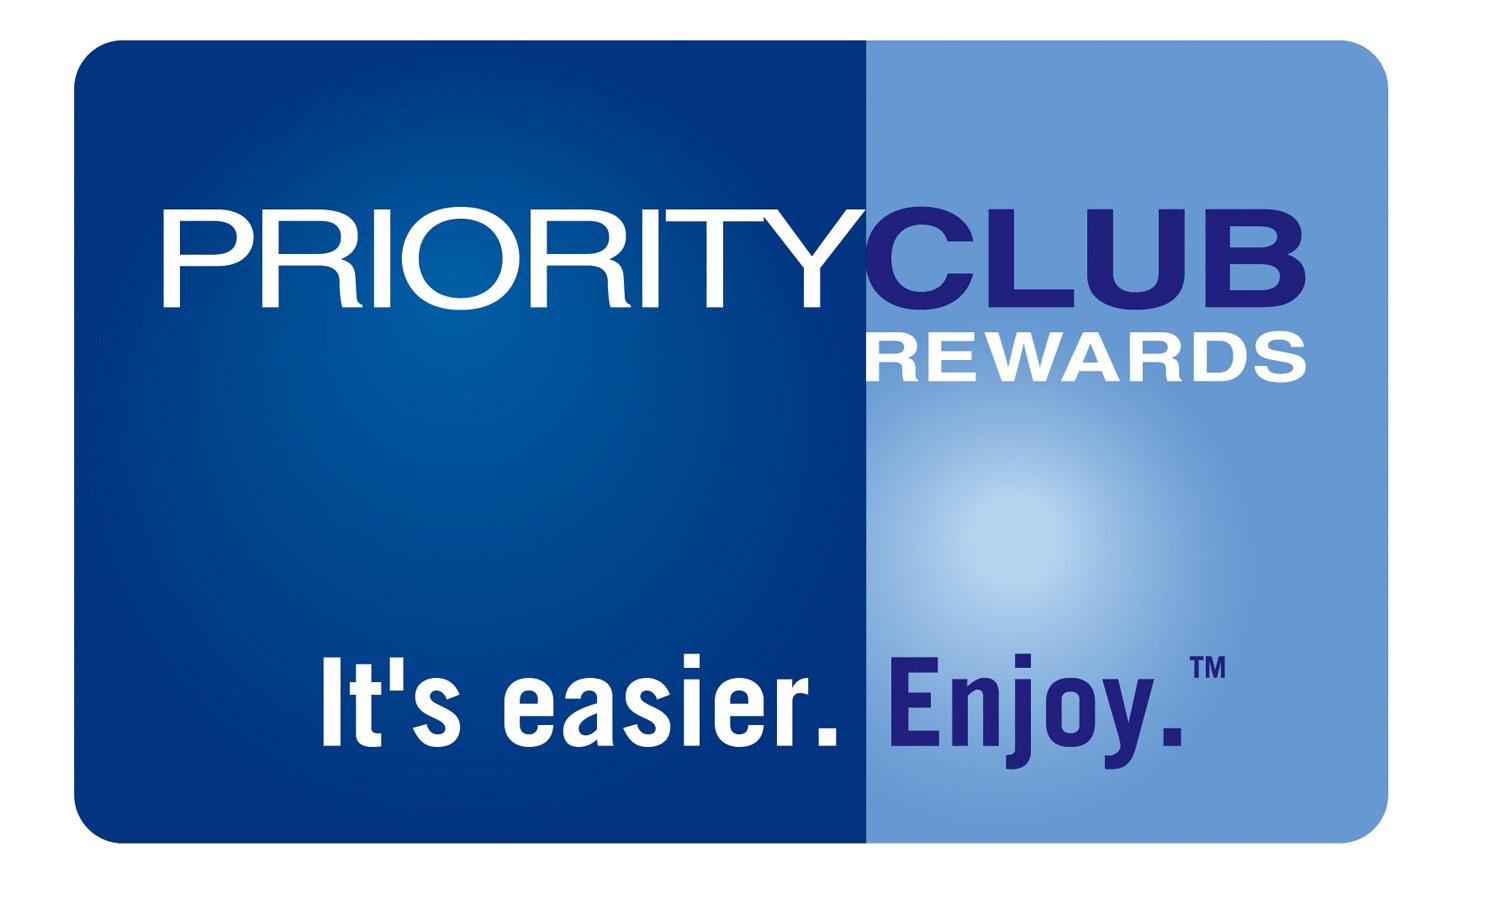 Priority Club Rewards Loyalty program card, then / Карта программы лояльности, раньше